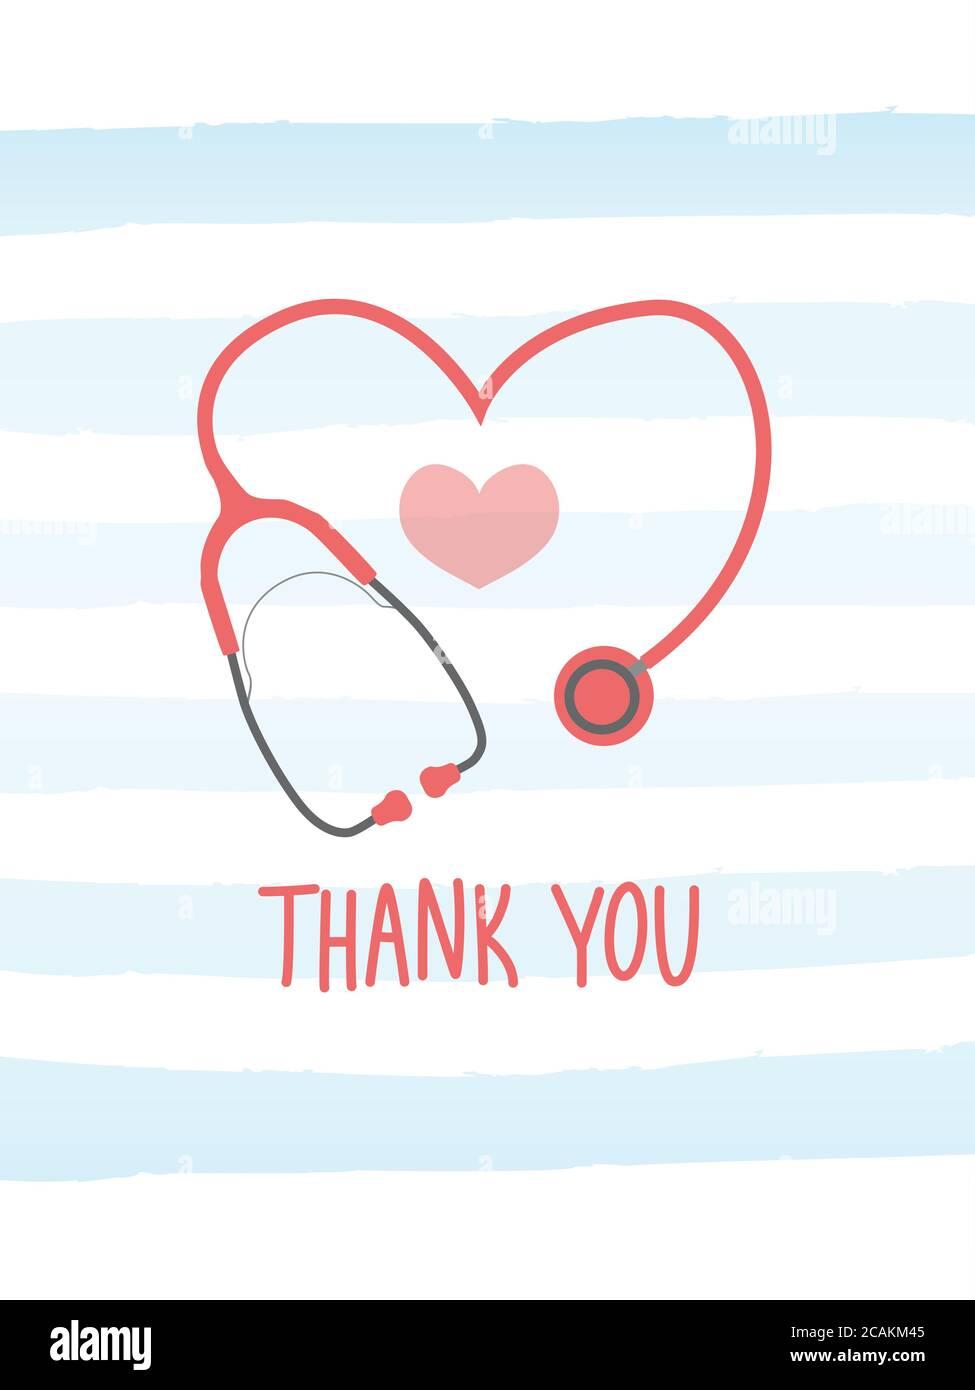 Nurse Appreciation Card Nurse Thank You Card Stethoscope Card Nurse Heart Card Nurse Stethoscope Heart Doctor Card